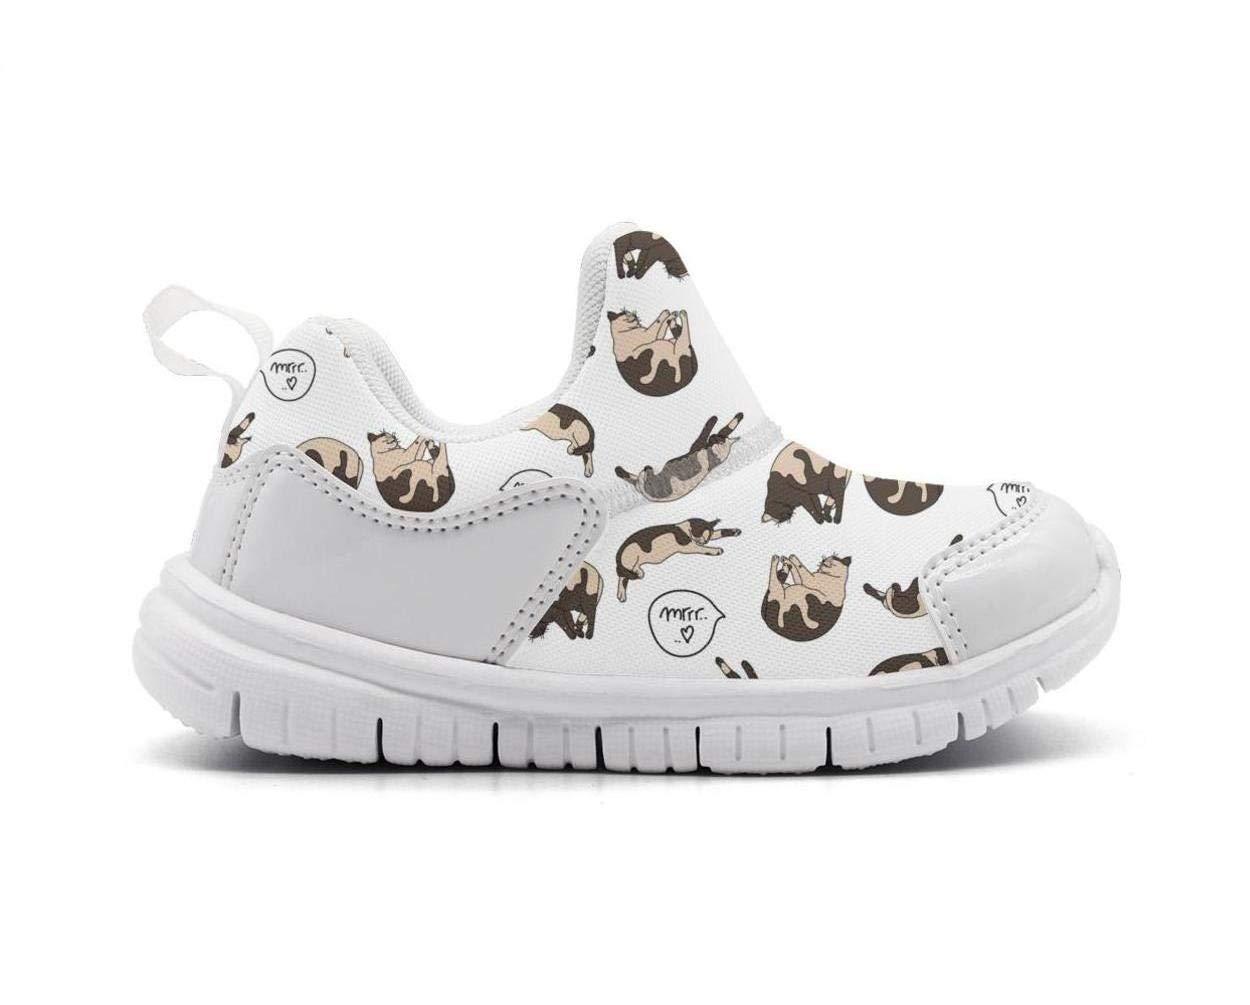 ONEYUAN Children Sleeping Persian Cat Snoring Kid Casual Lightweight Sport Shoes Sneakers Running Shoes